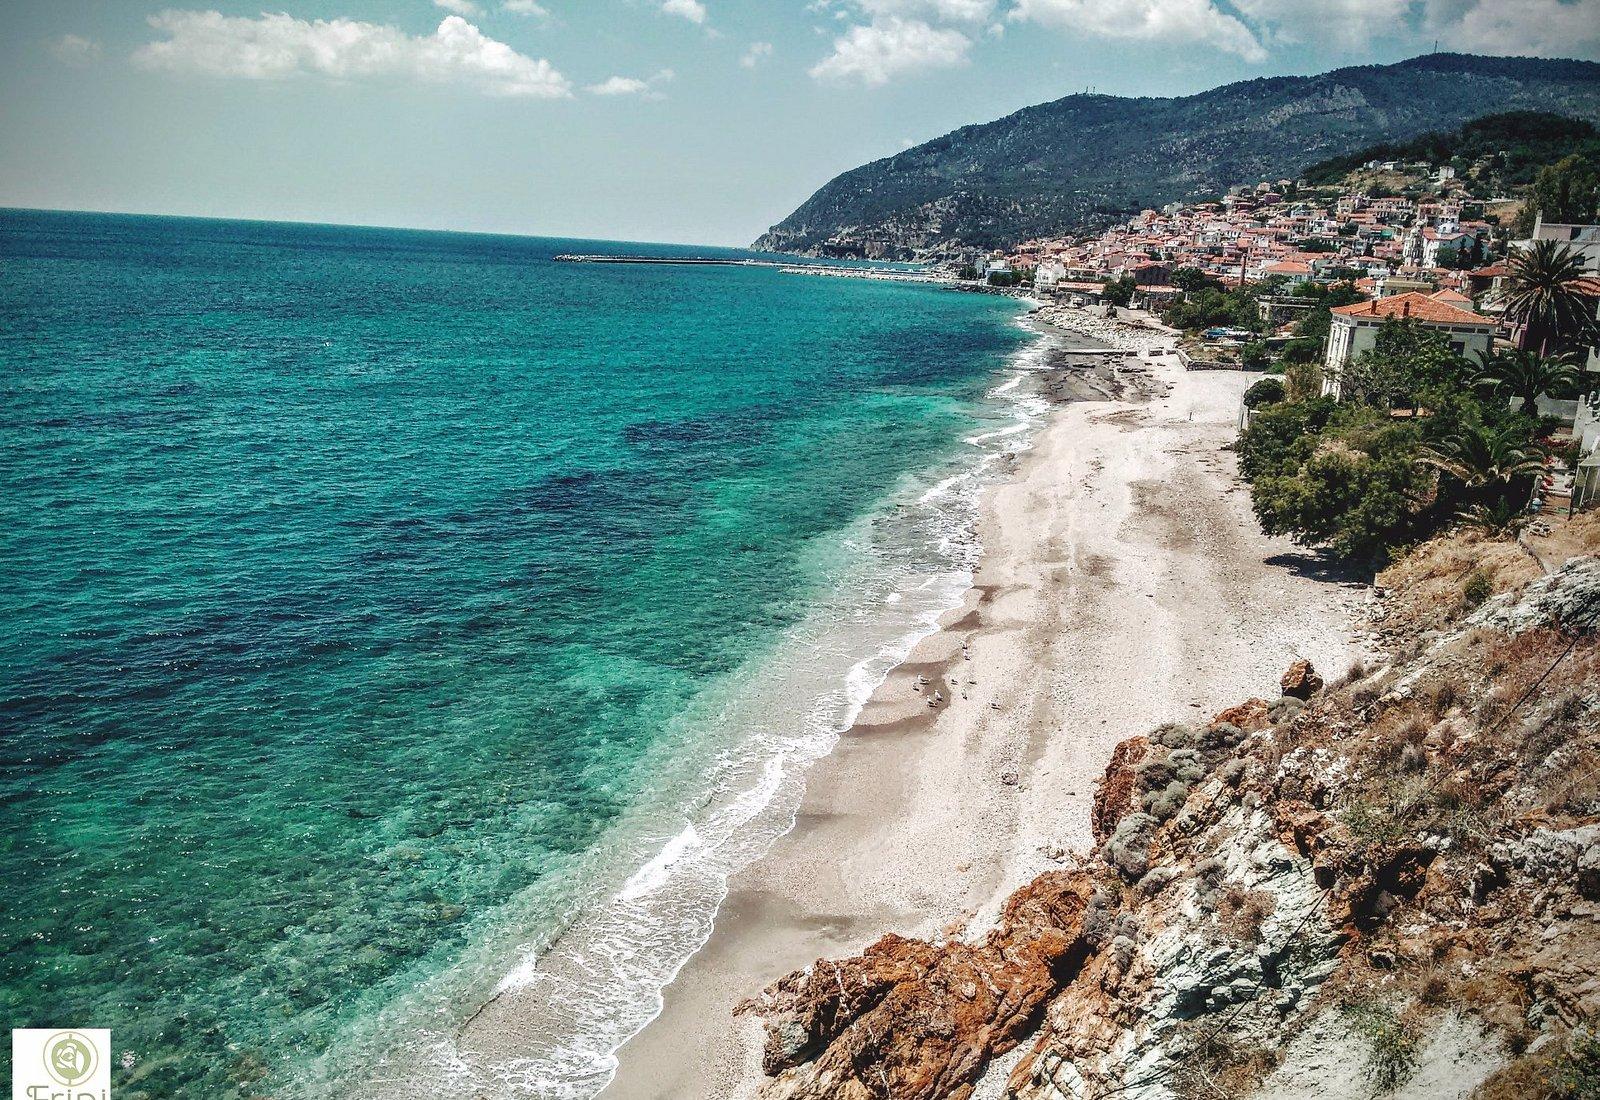 Panoramic view of the beautiful Plomari